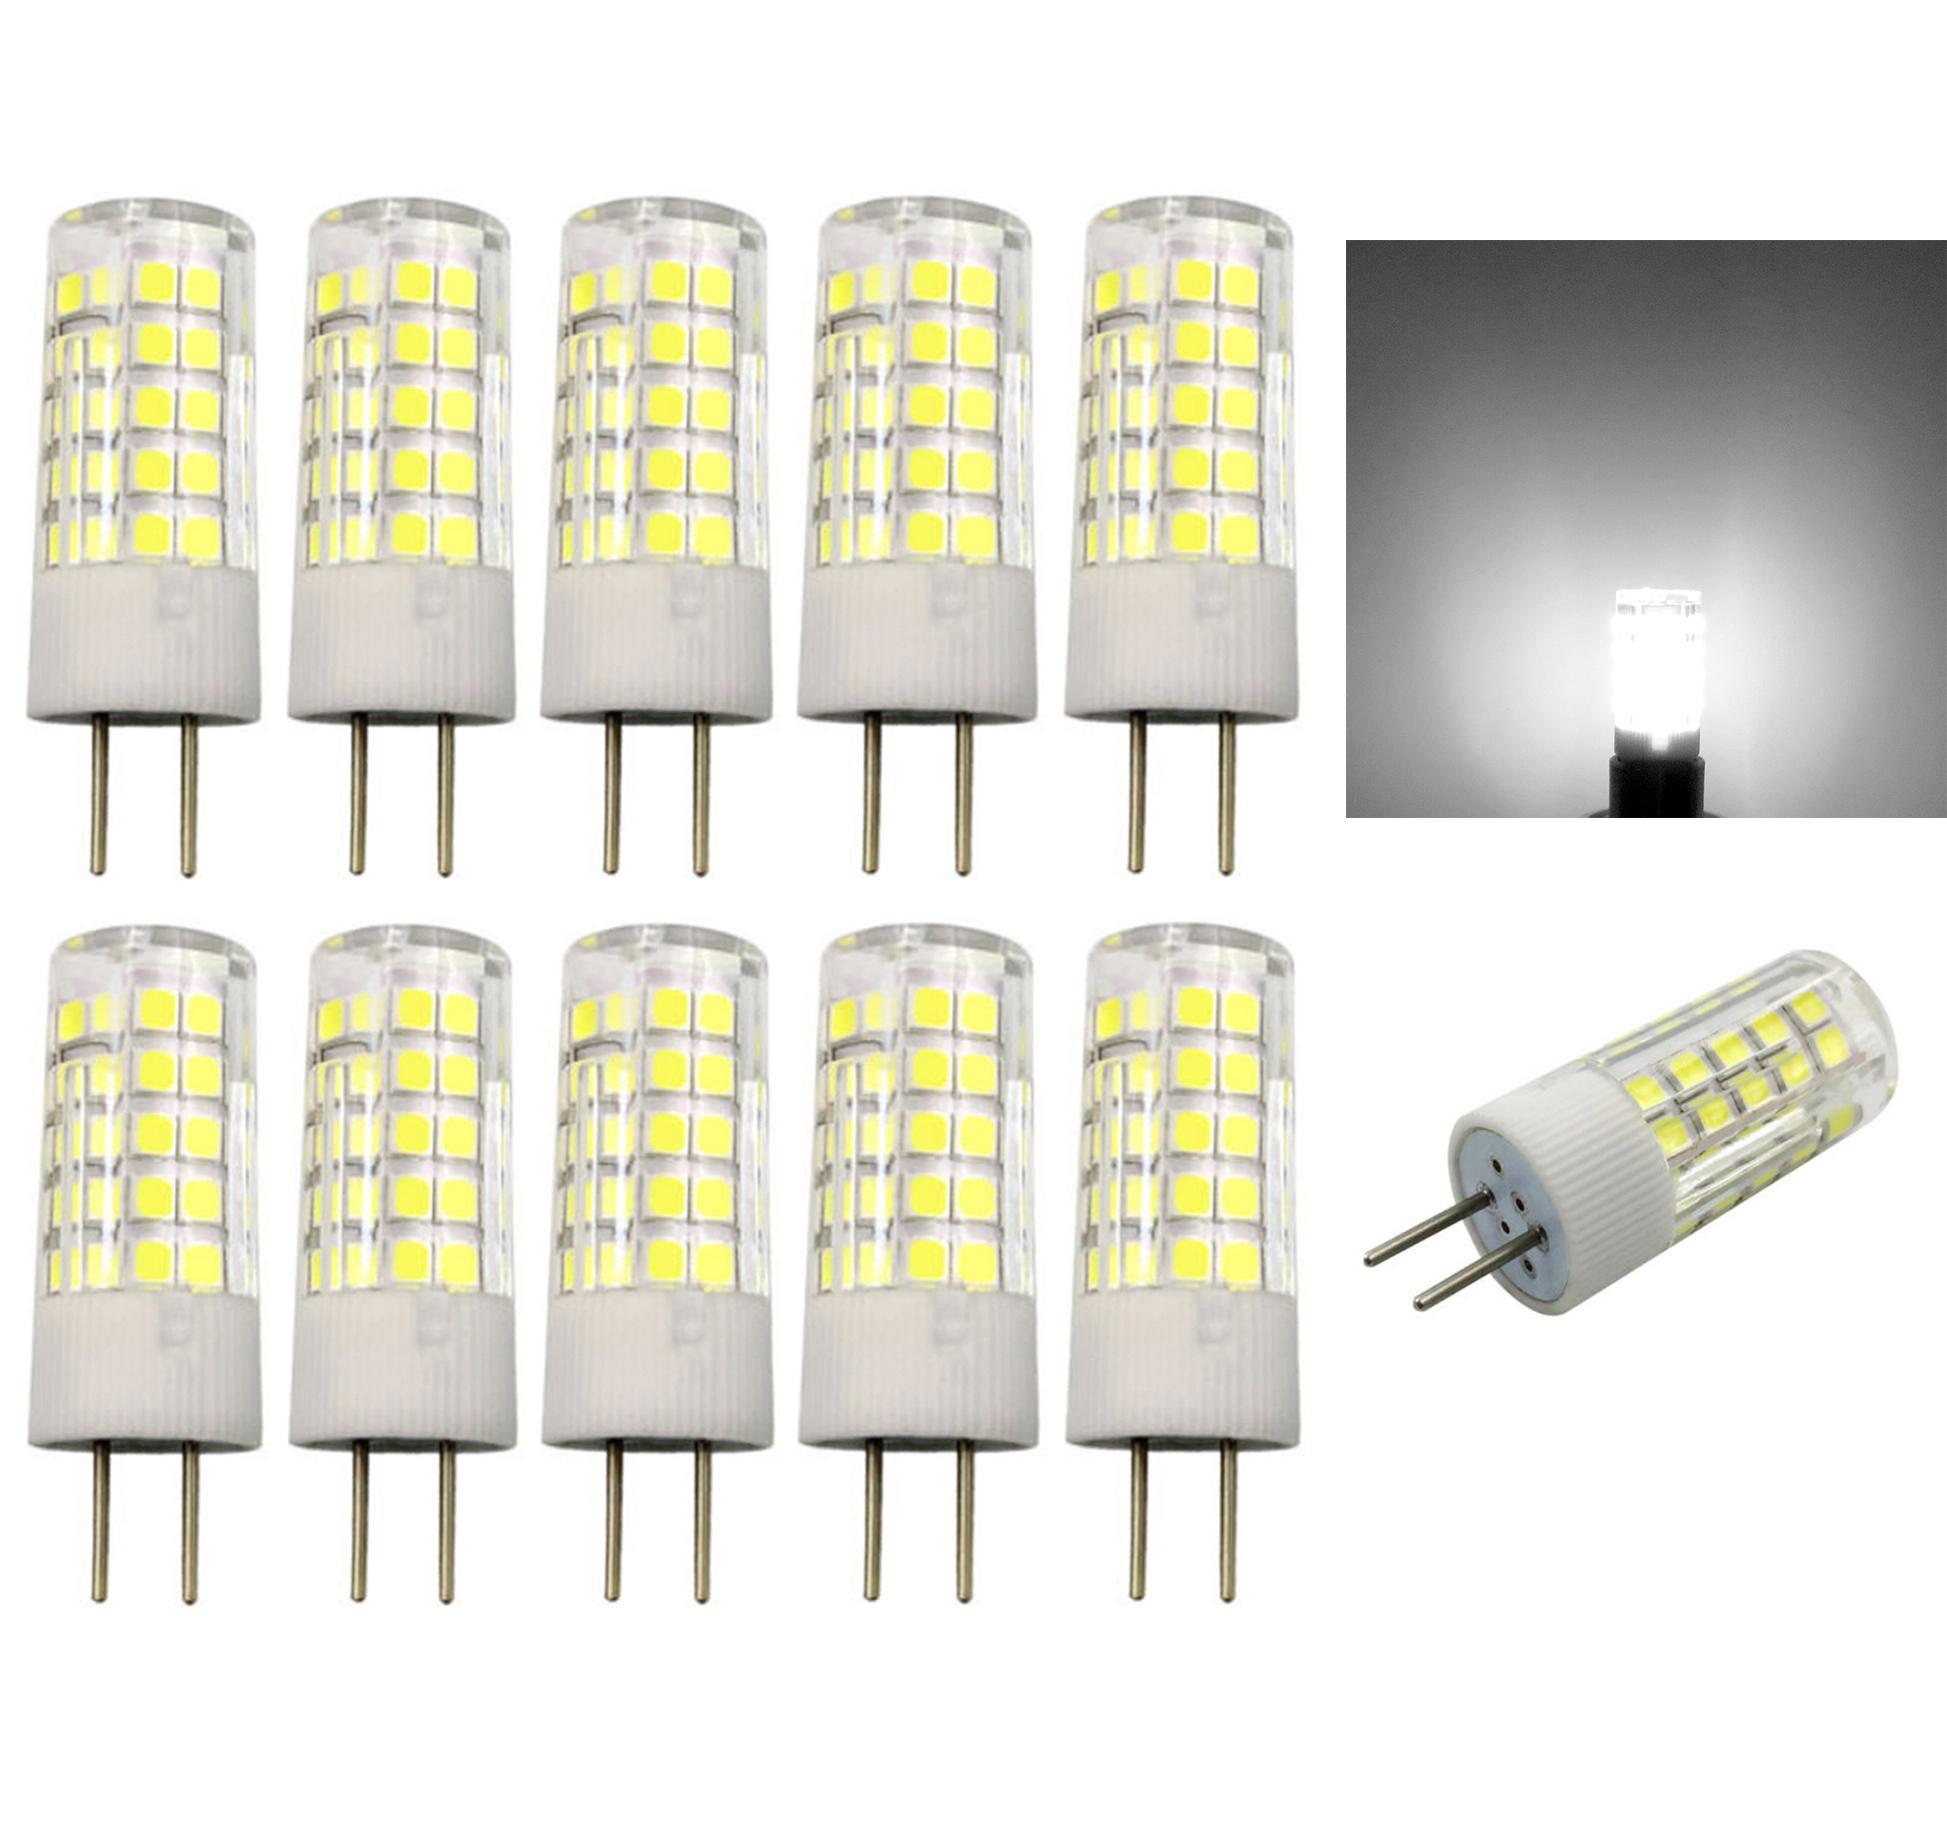 Пакет 10, GY6. 35 (G6.35/GX6.35) светодиодная лампа 5W MINI 64-2835 SMD лампа ACDC 12V керамика белый свет